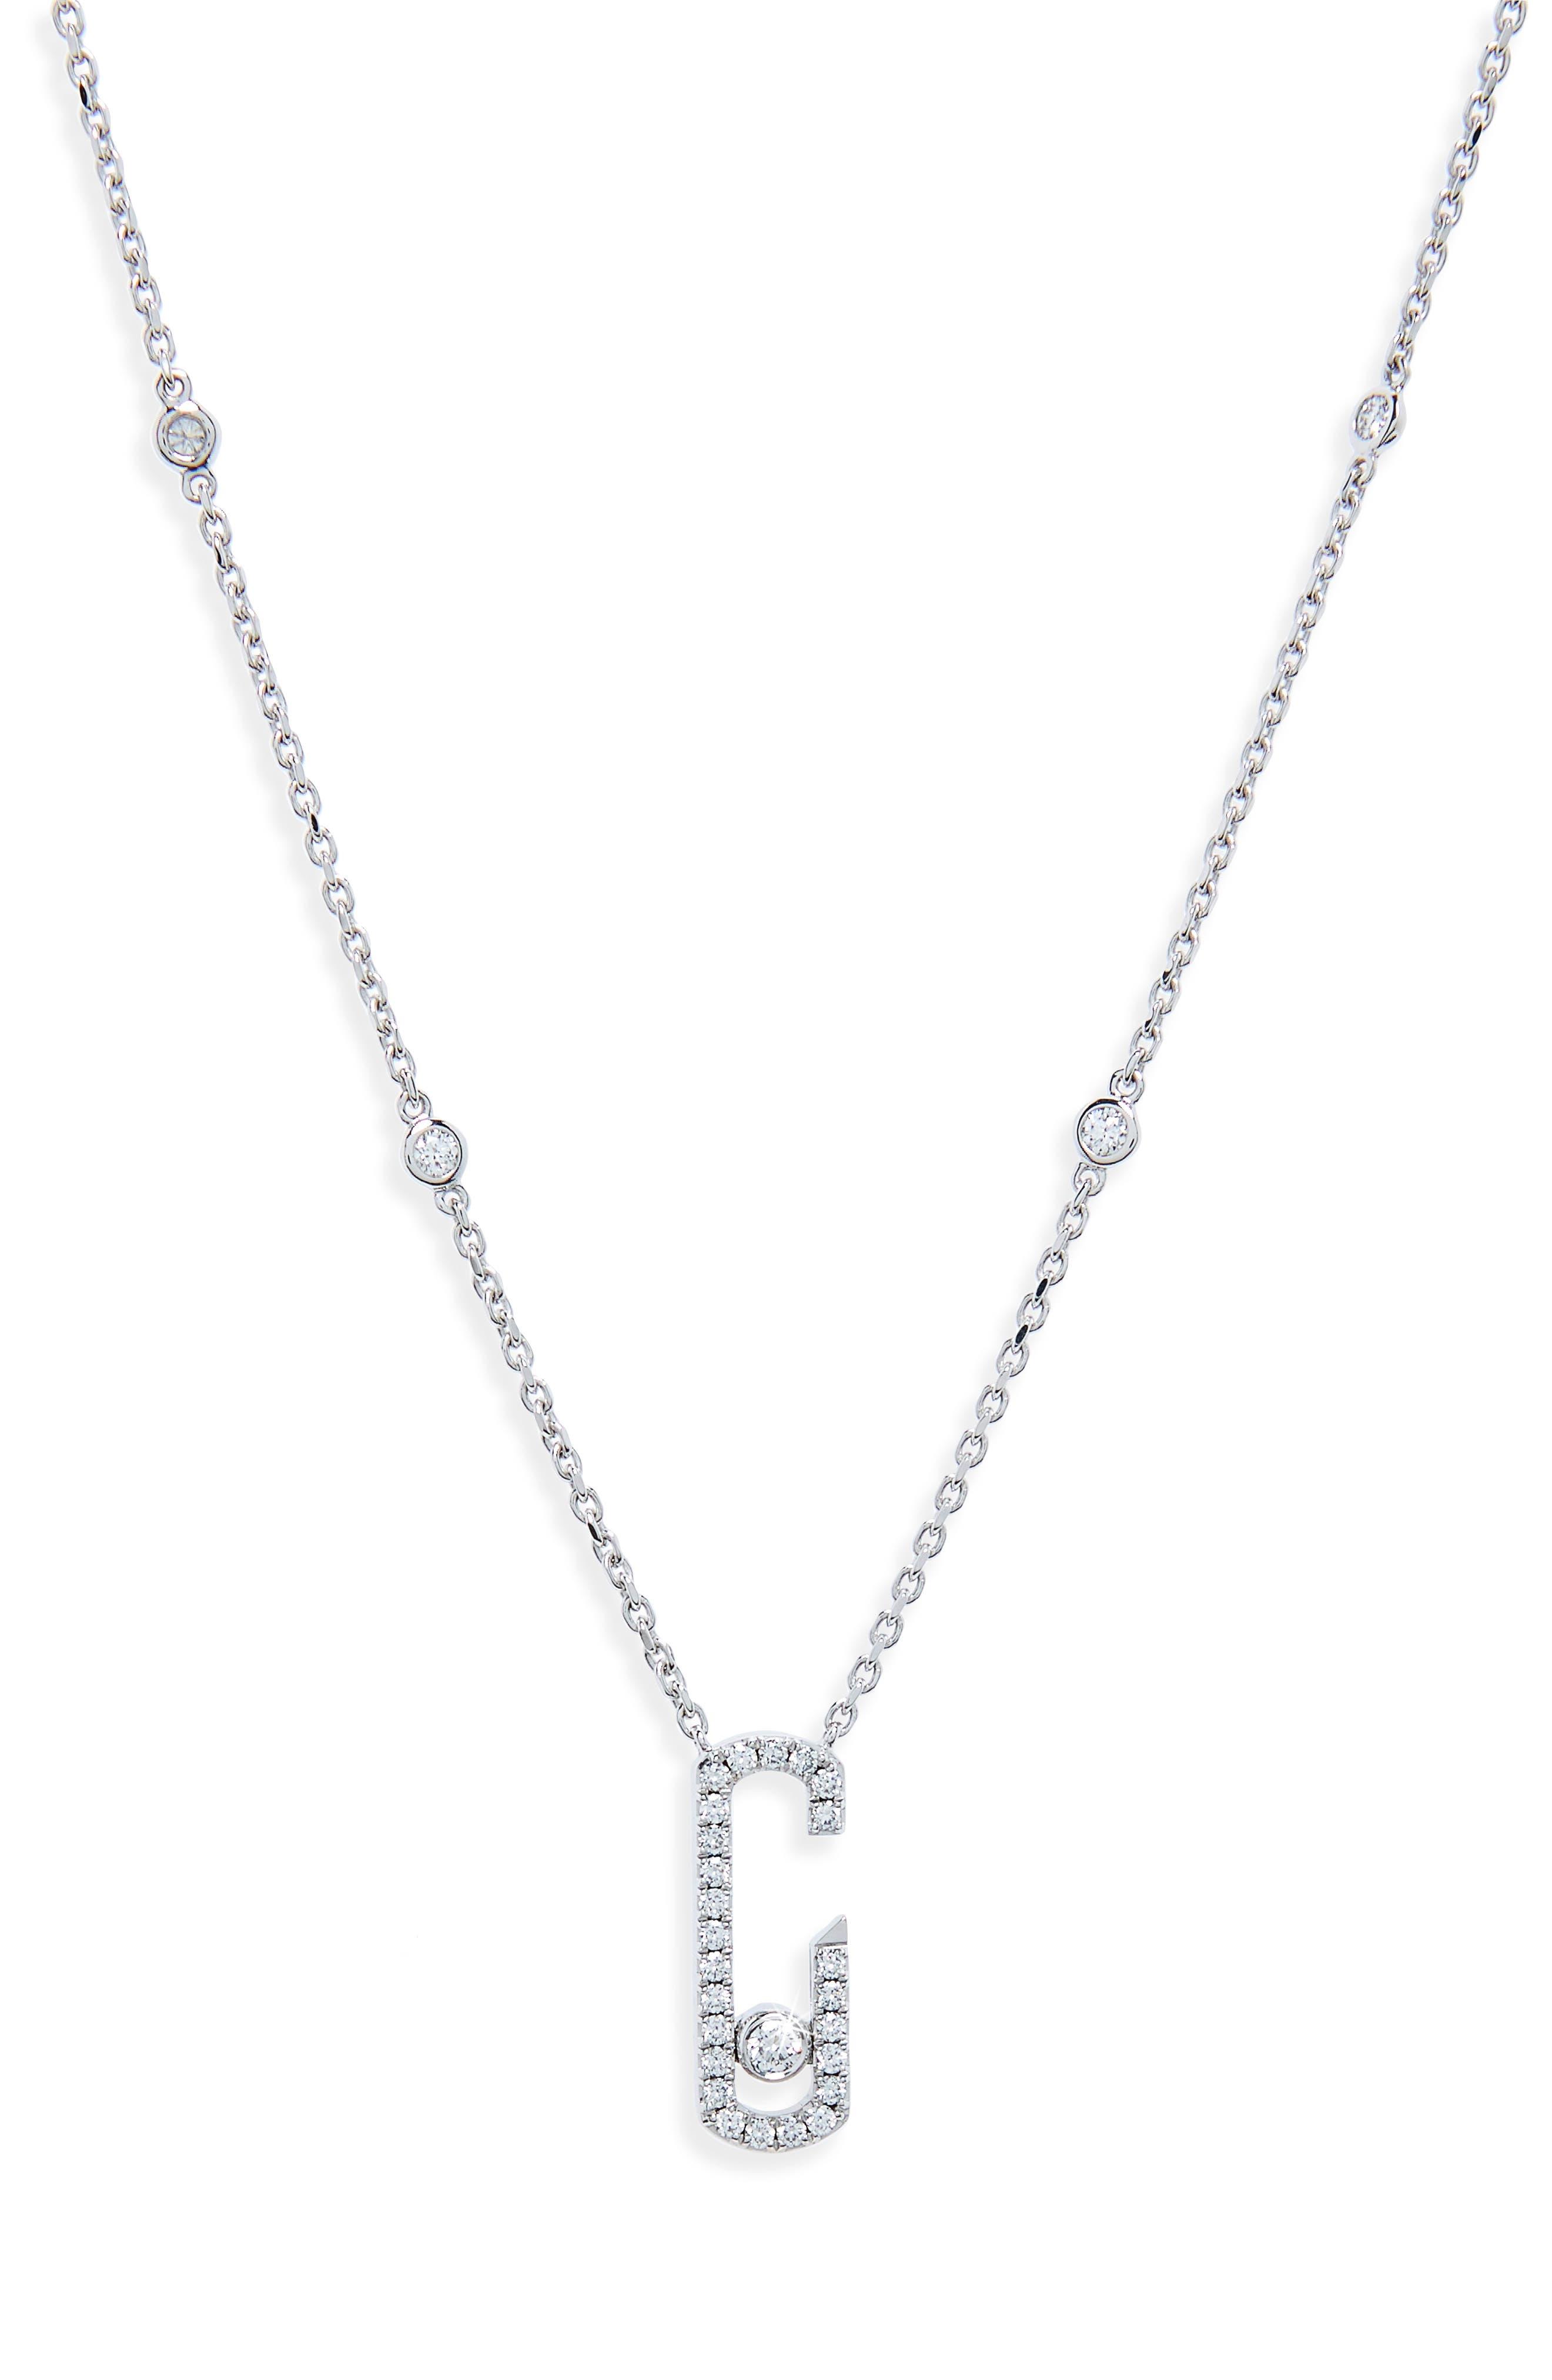 by Gigi Hadid Move Addiction 18K Gold & Diamond Pendant Necklace,                             Main thumbnail 1, color,                             White Gold